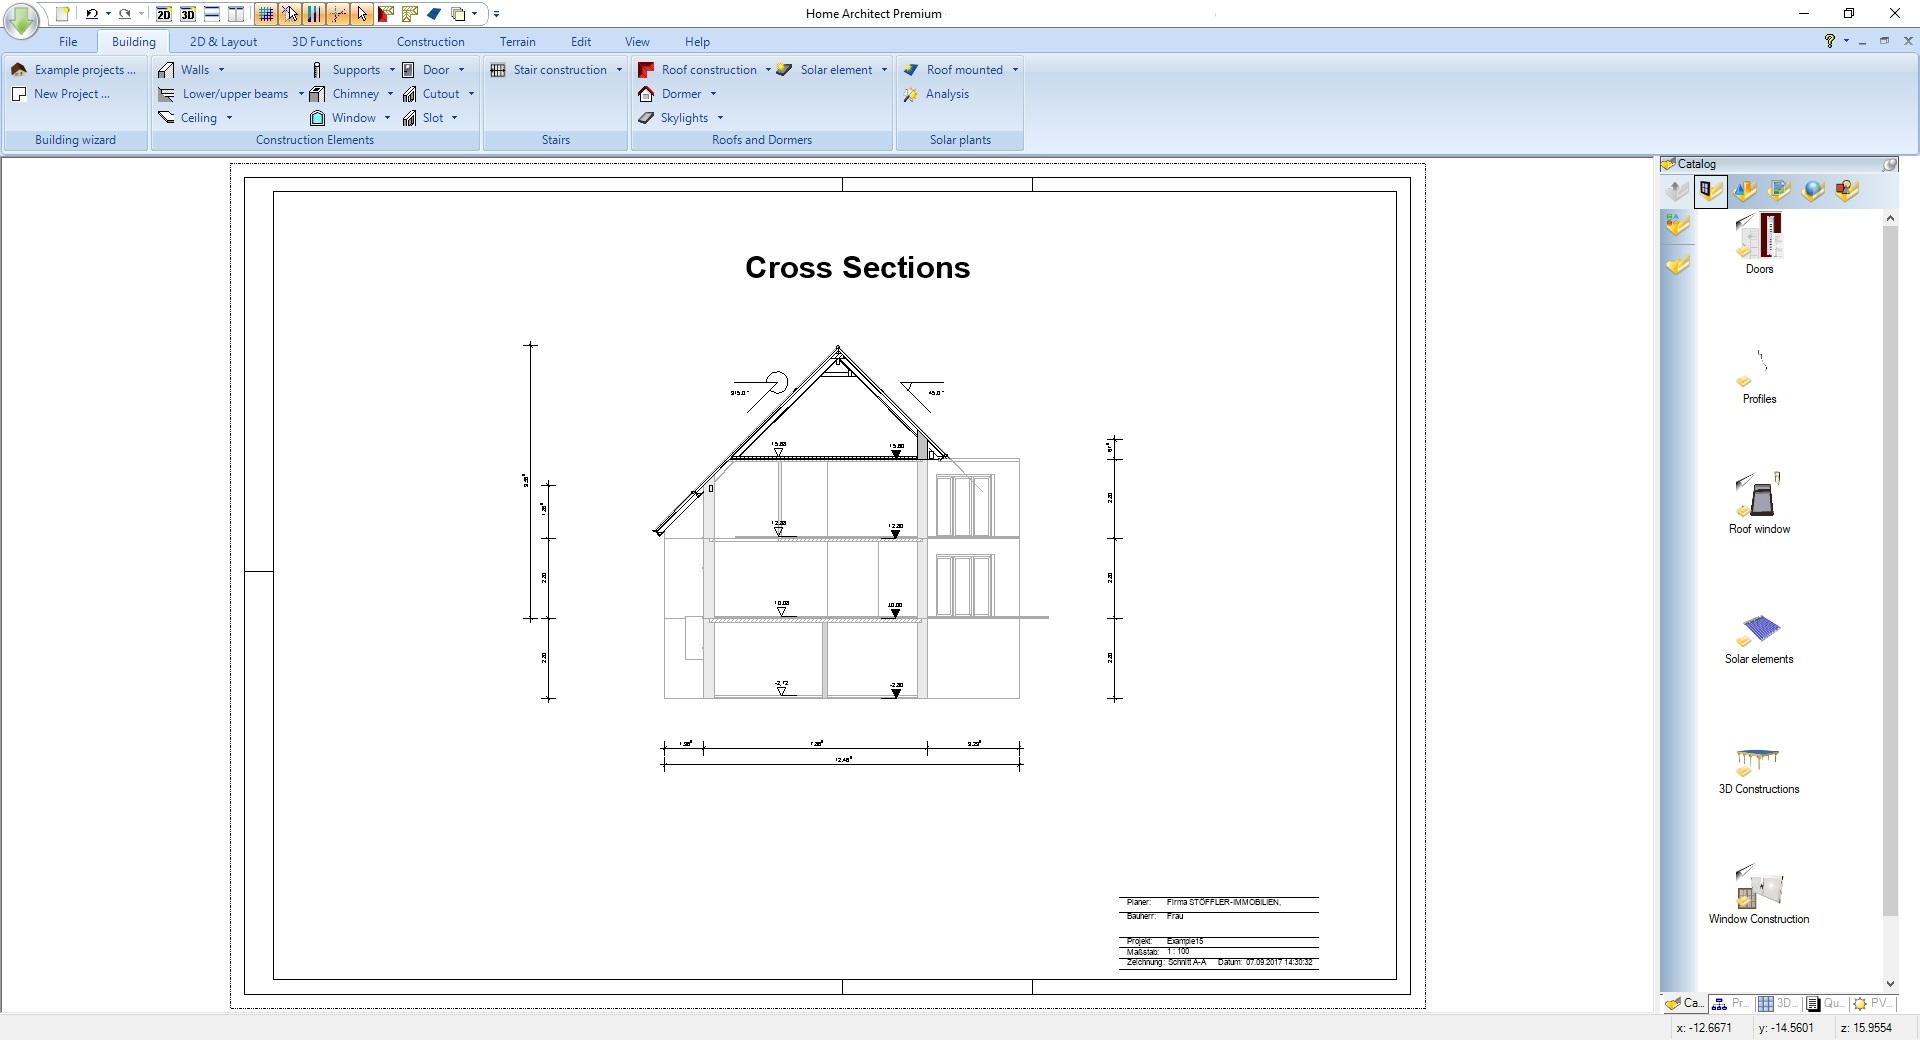 Aplicativos : Home Architect - Design your floor plans in 3D